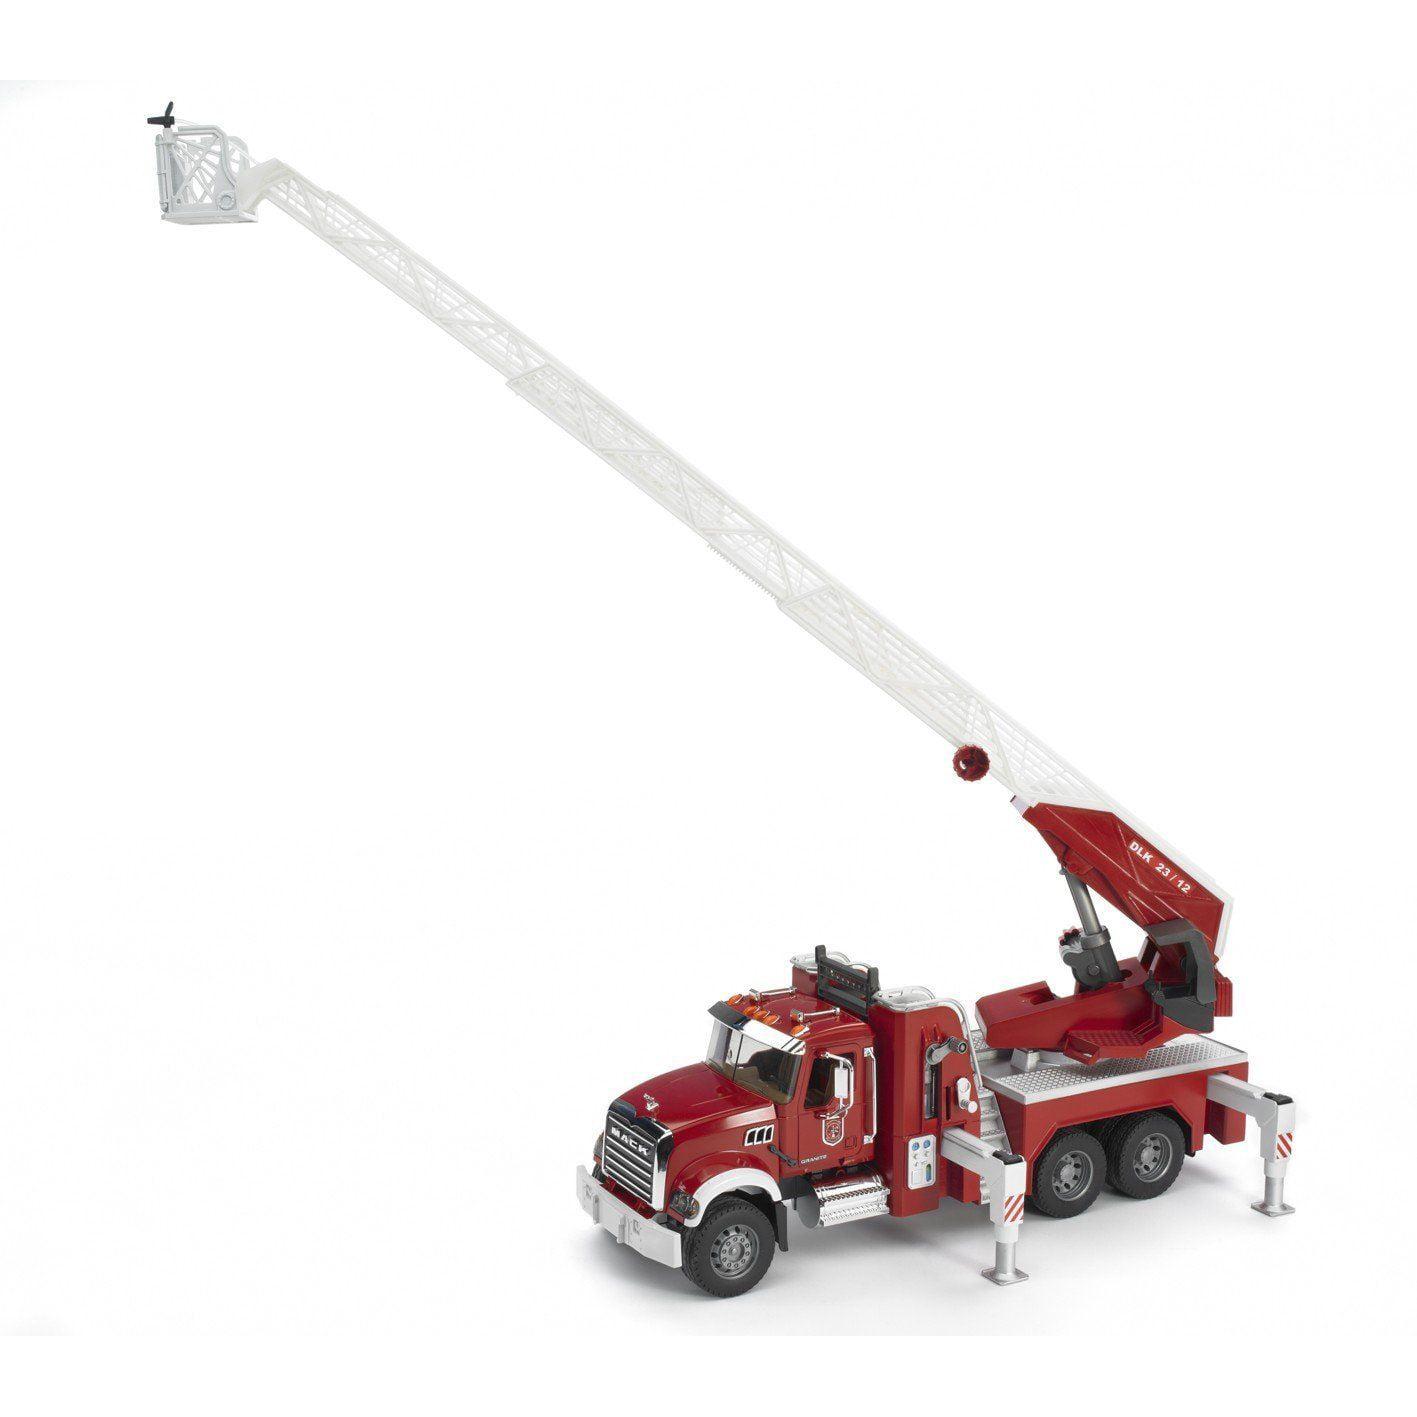 Fire Engine Mack Granite Vehicle Toys by Bruder Trucks (02821) by Bruder Trucks